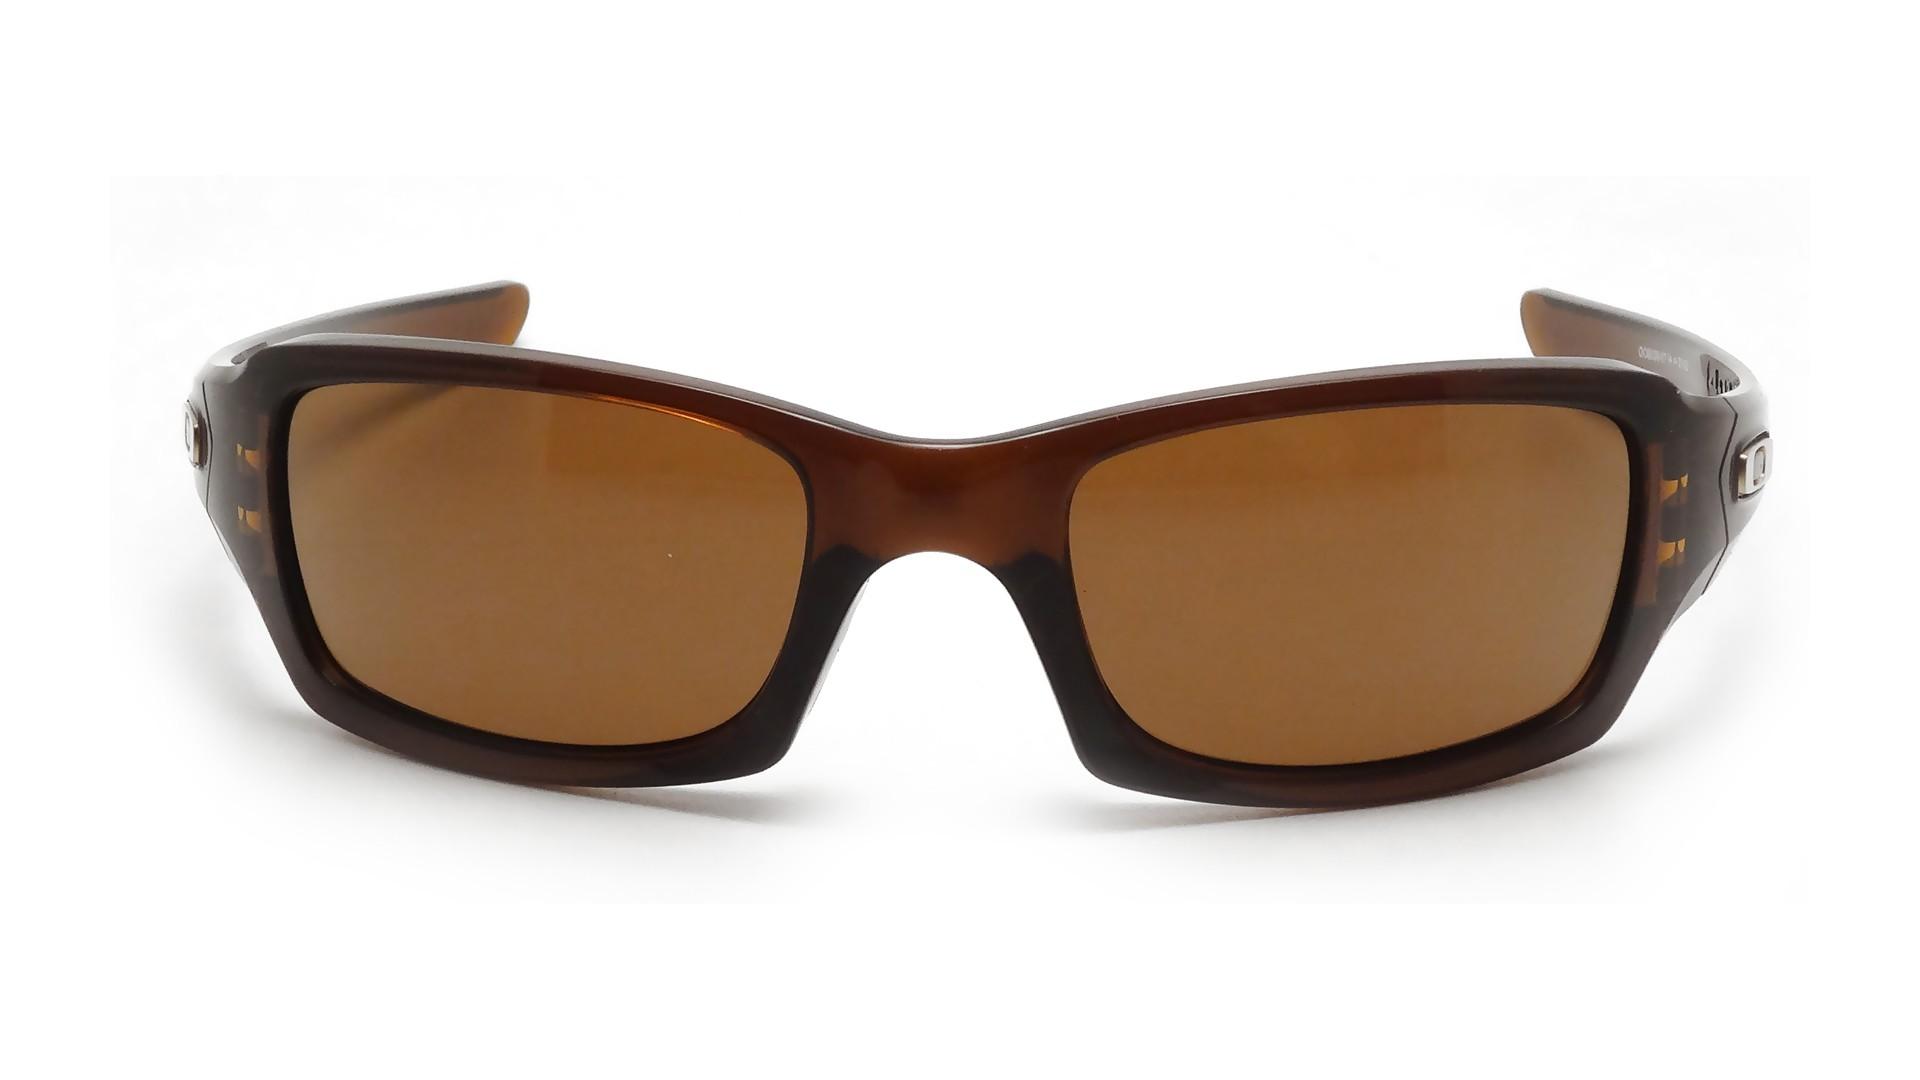 OAKLEY Sonnenbrille Fives Squared Lhdrn1Ewvs